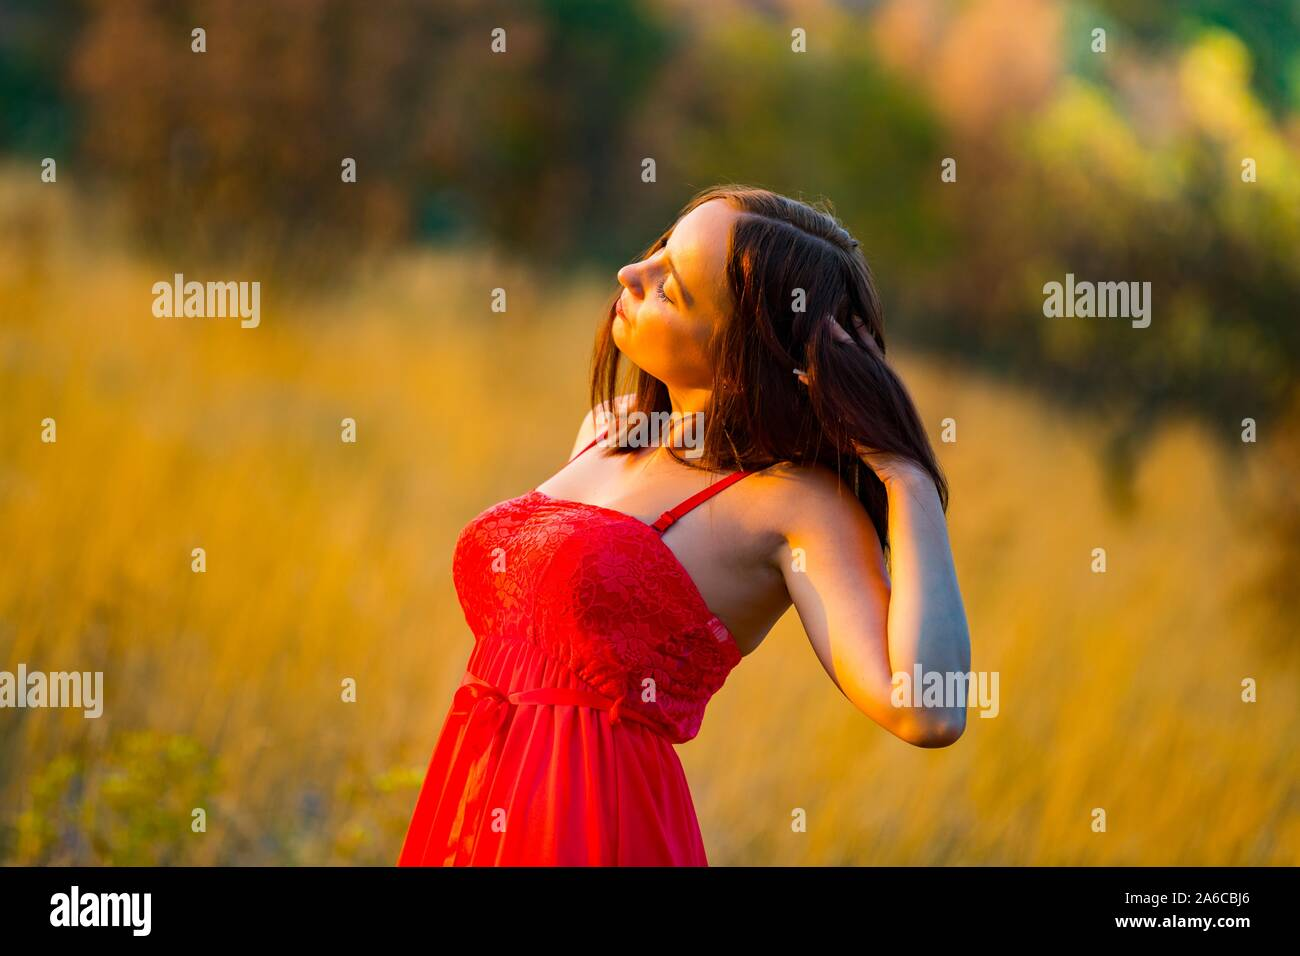 Sunshine warm sunset light isolated from background bokeh Stock Photo